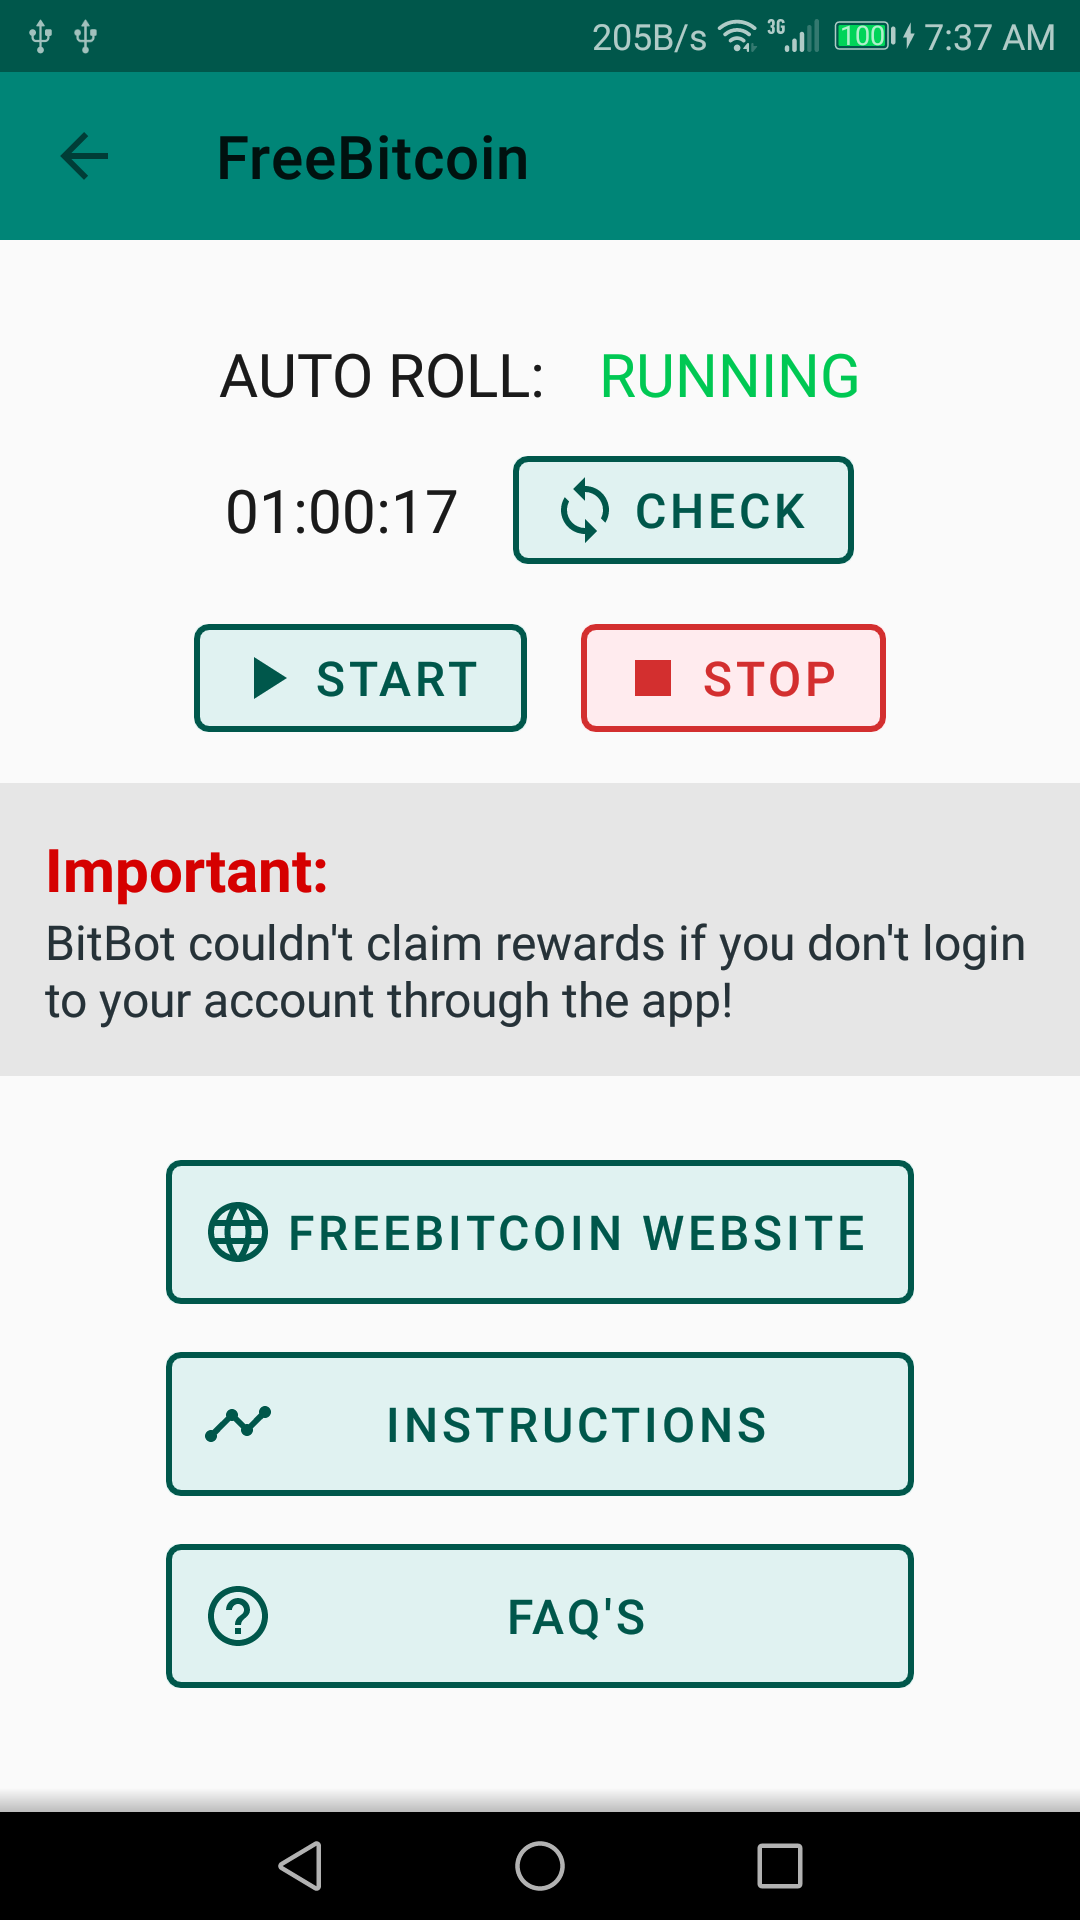 freebitcoin auto roll scottrade galimybių lygiai